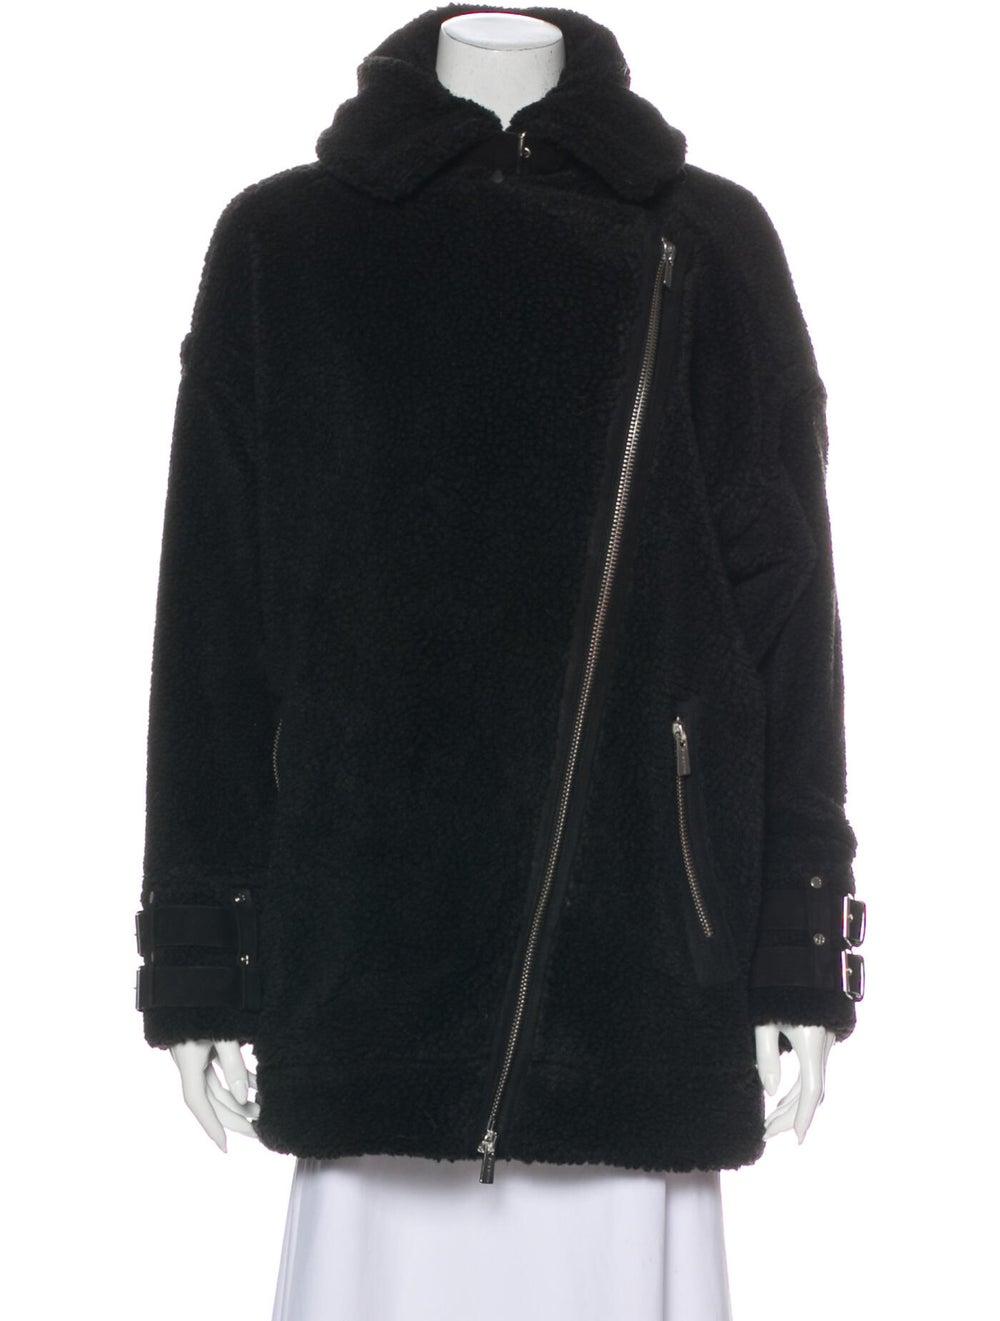 Anine Bing Coat Black - image 4